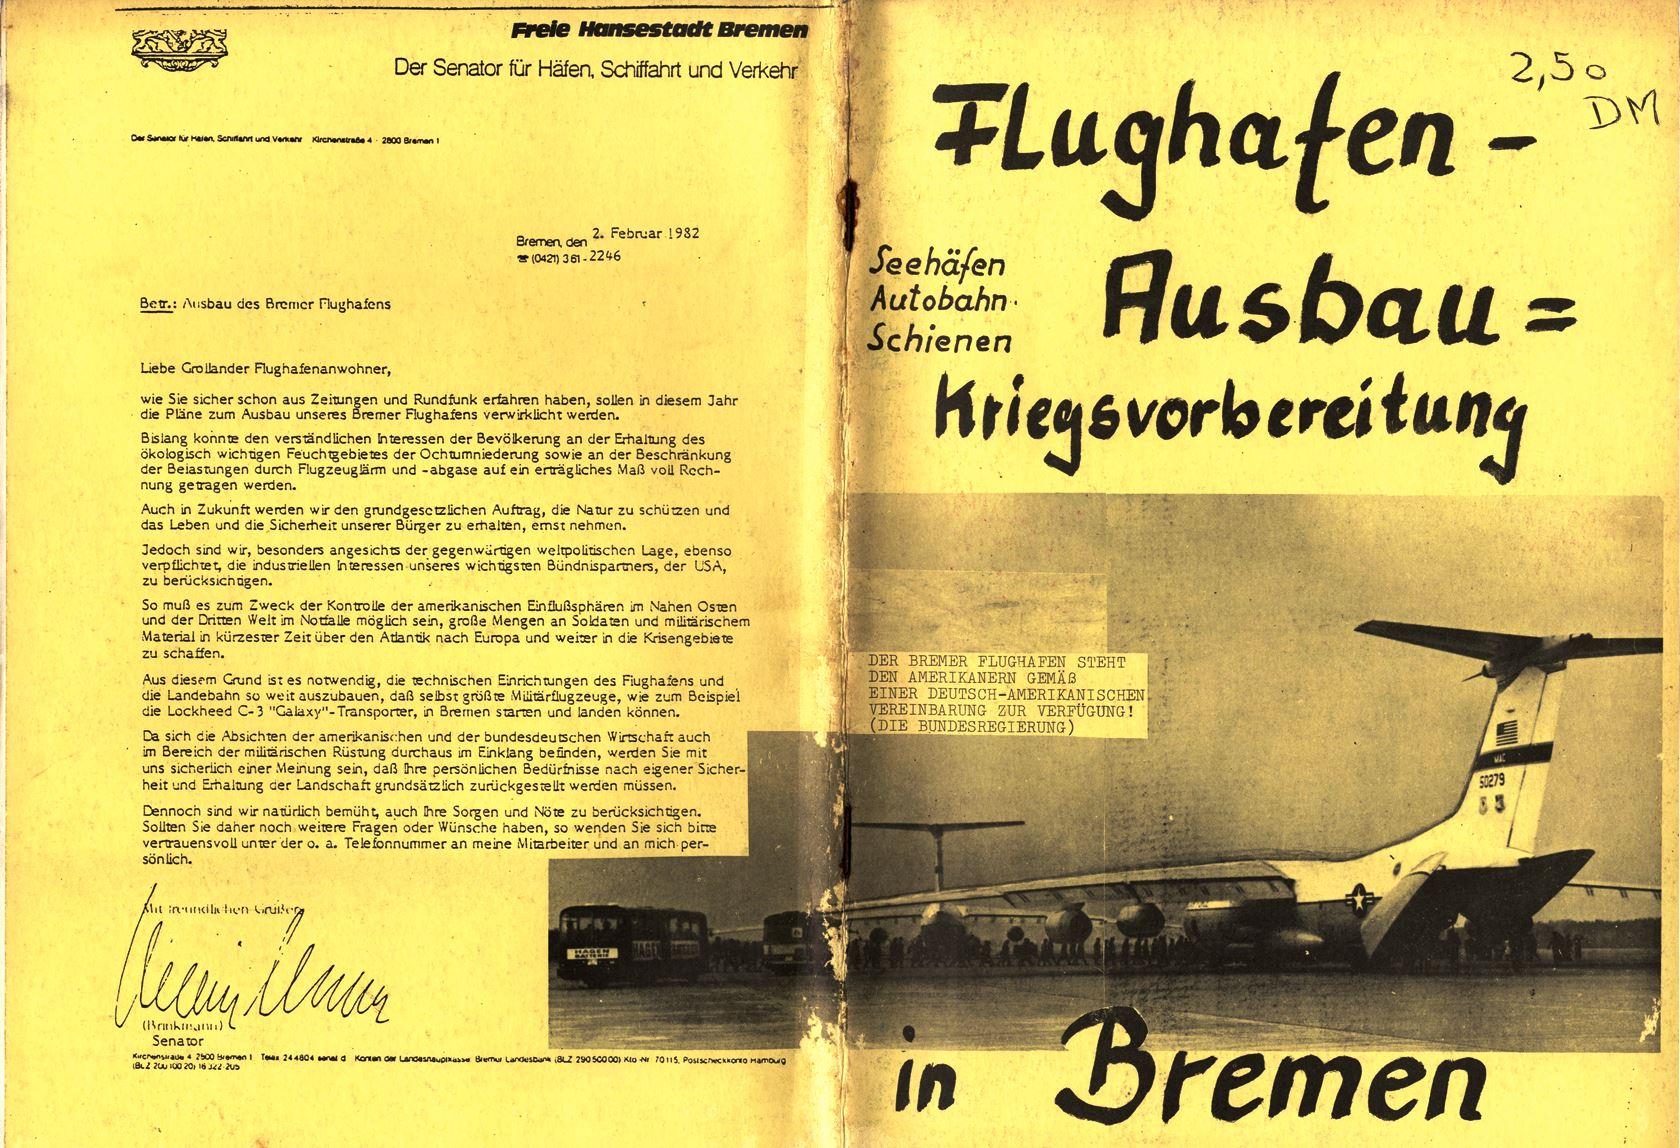 Bremen_Krieg_dem_Krieg001